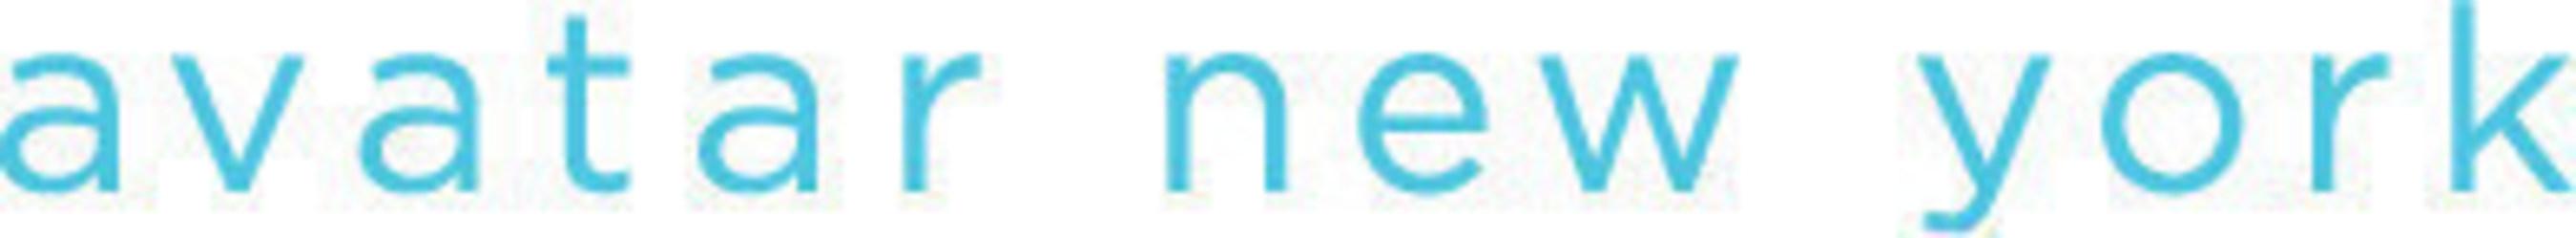 New York Web Design Agency Avatar New York 'Lists The Top 3 Visual Web Design Trends